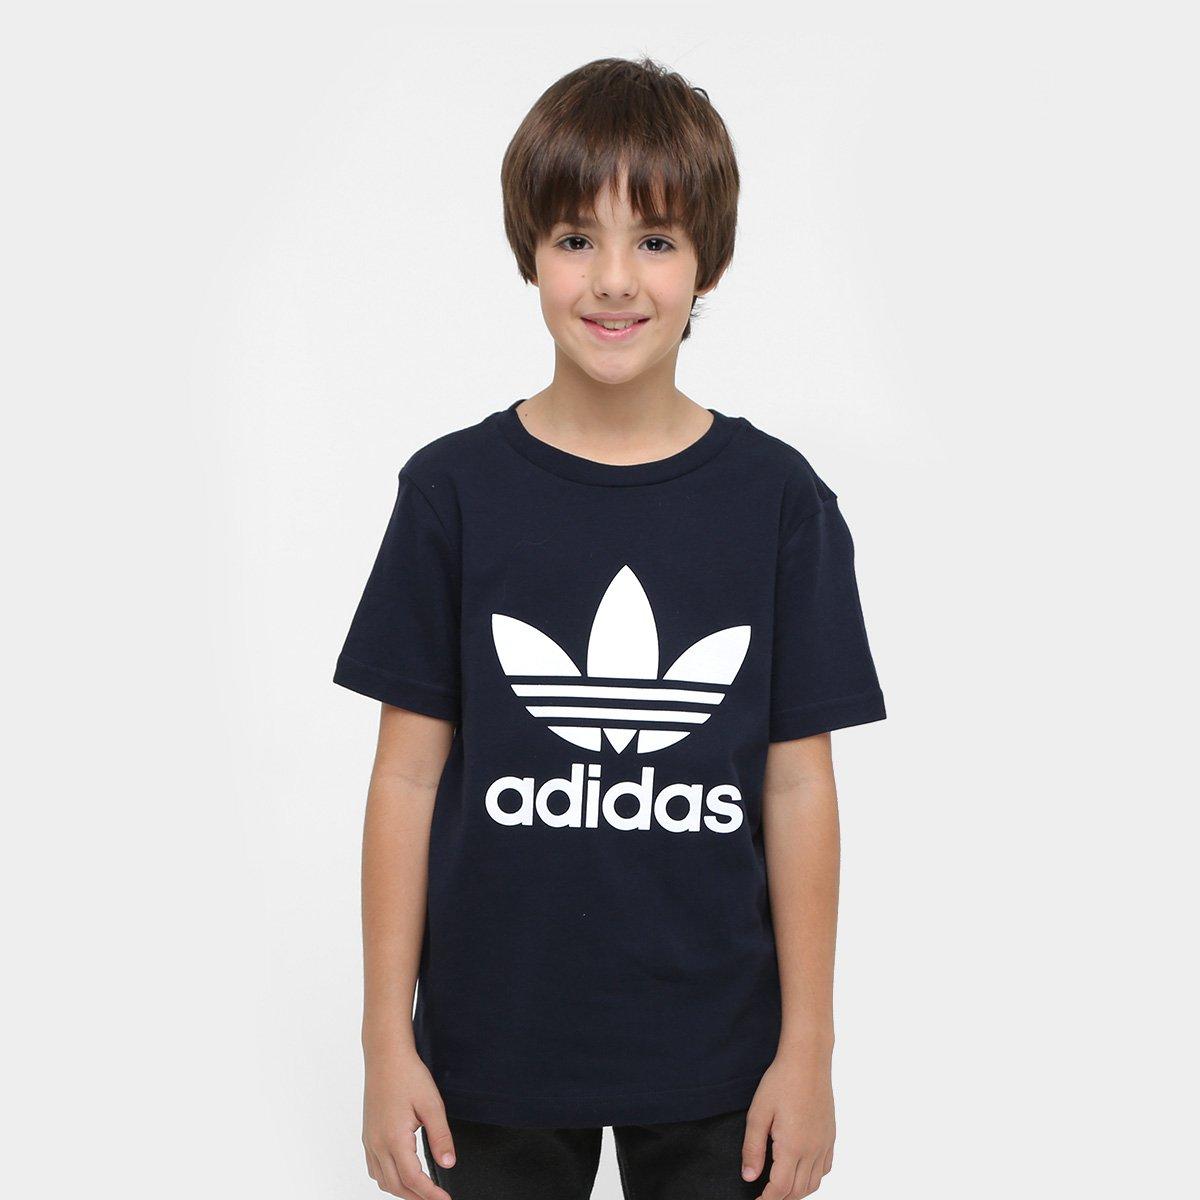 90021cff8ce Camiseta Infantil Adidas Trf J Masculina - Compre Agora